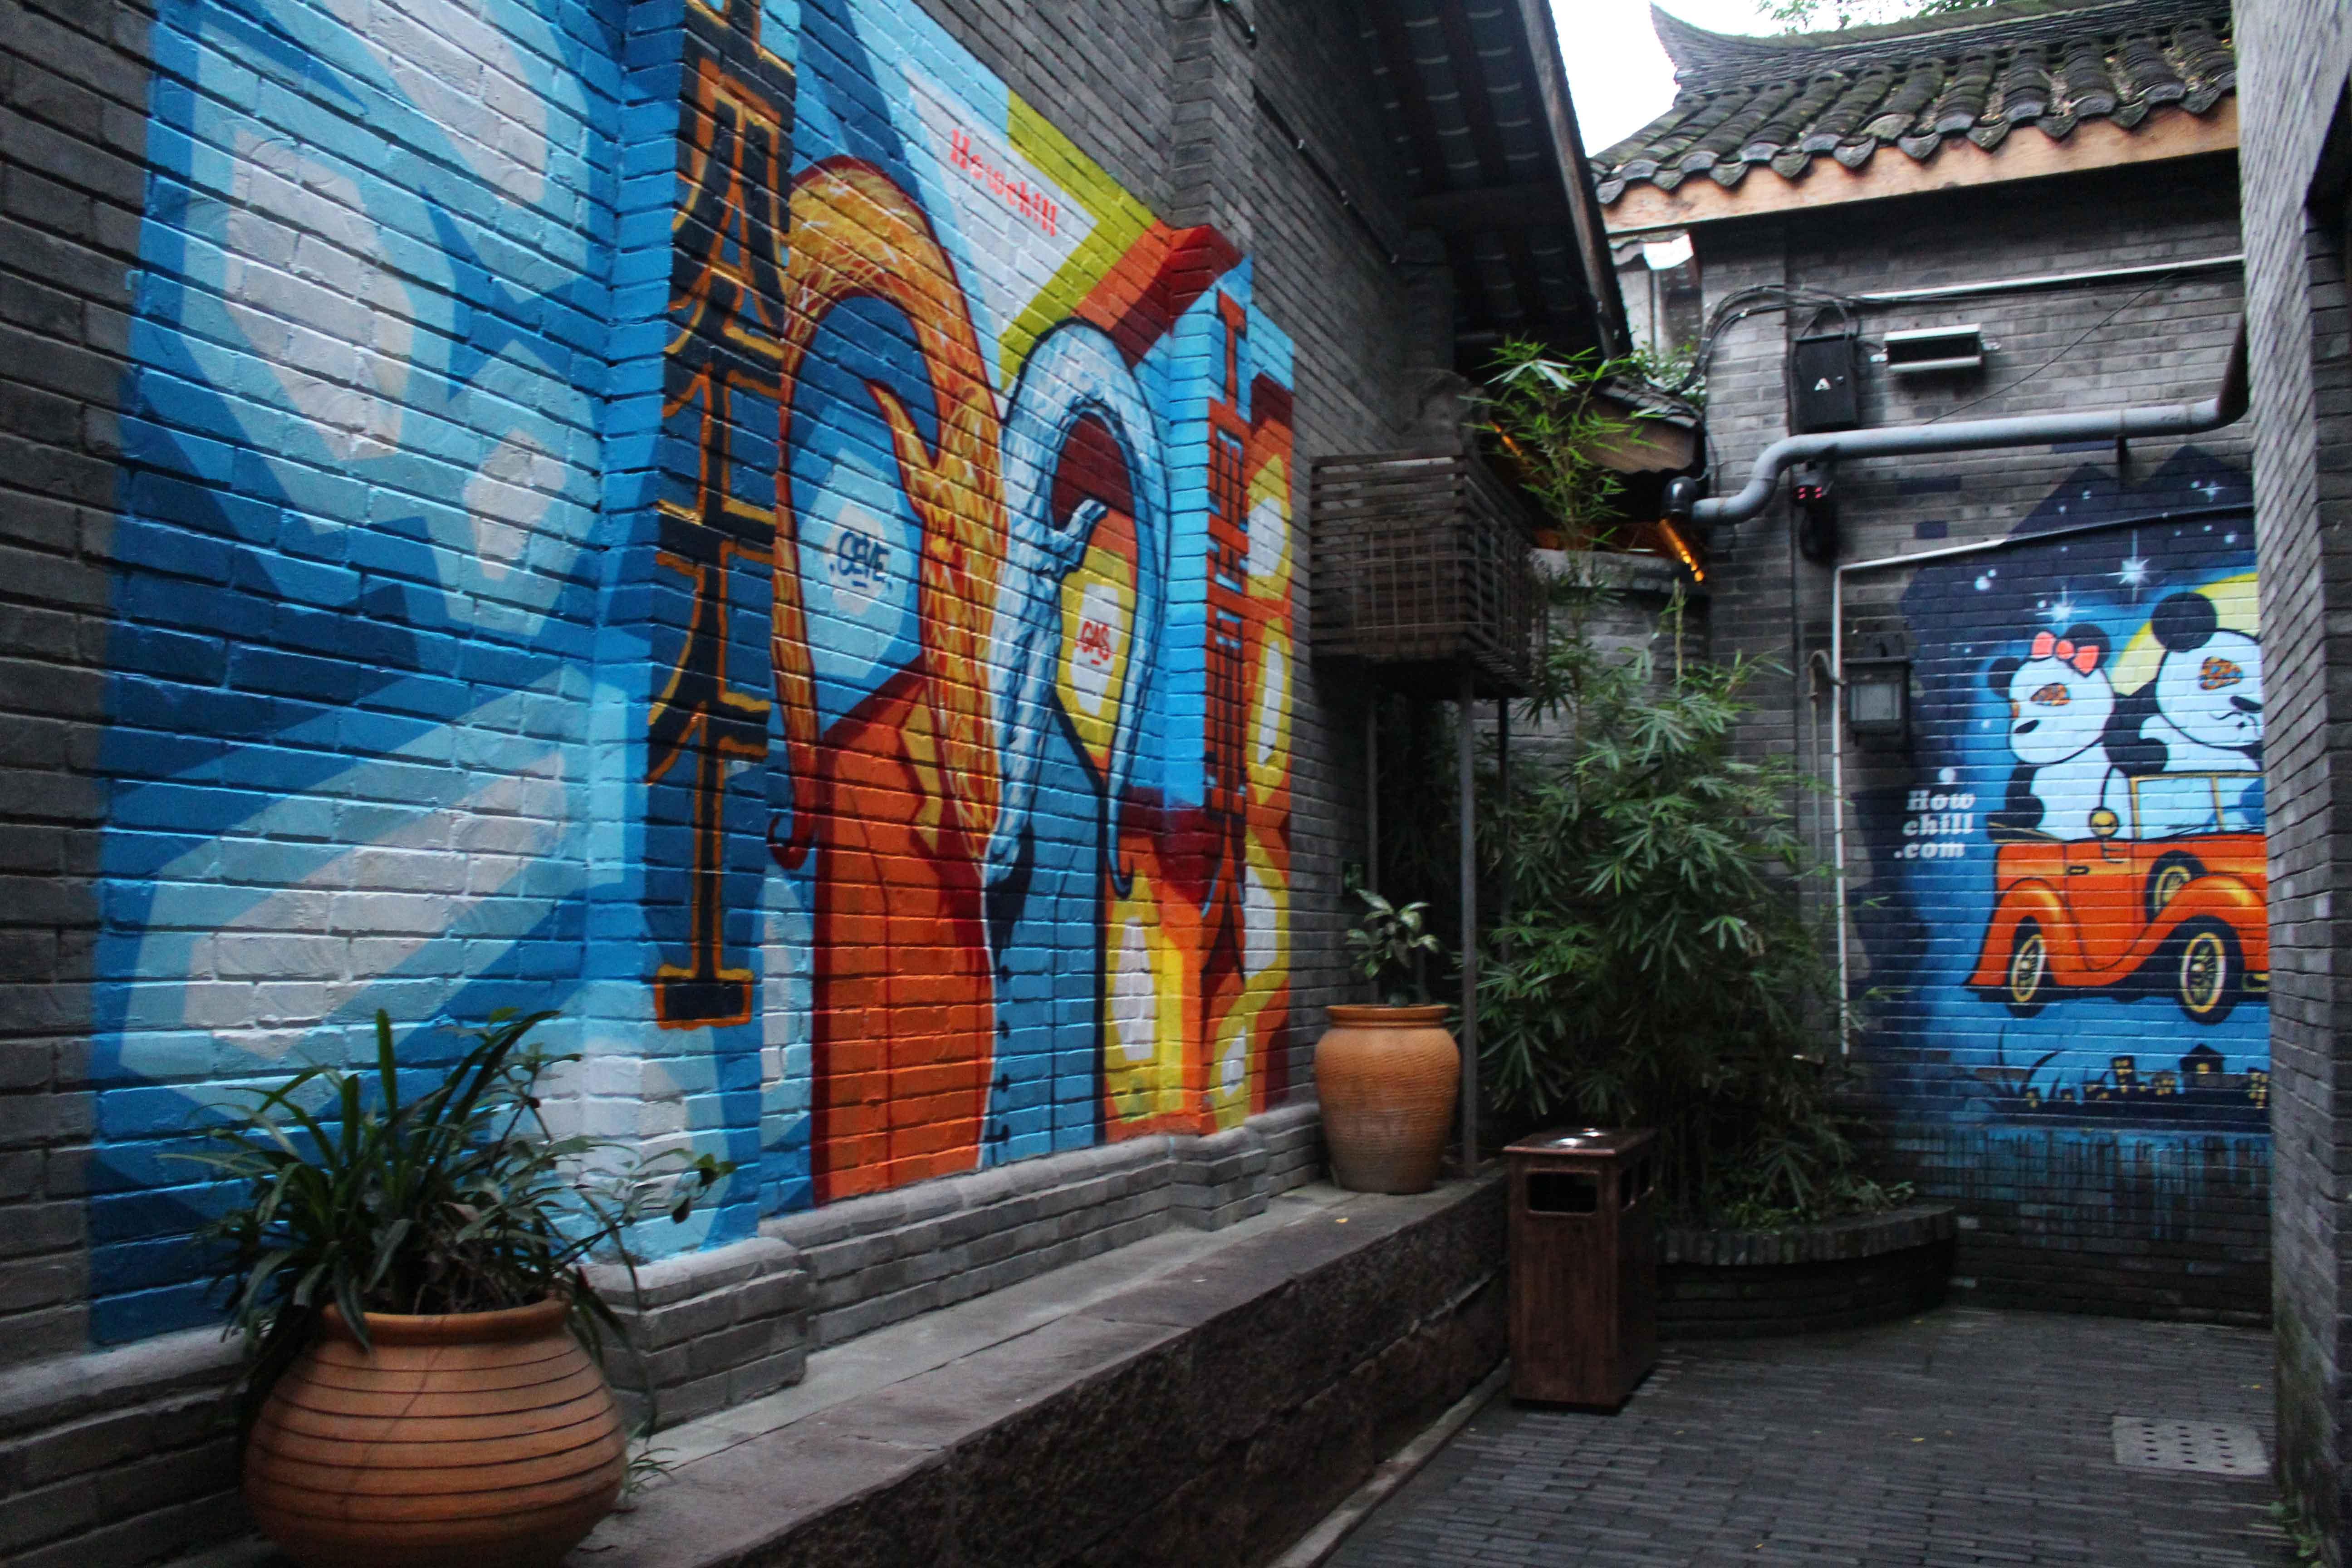 Chengdu Kuan Zhai Alley